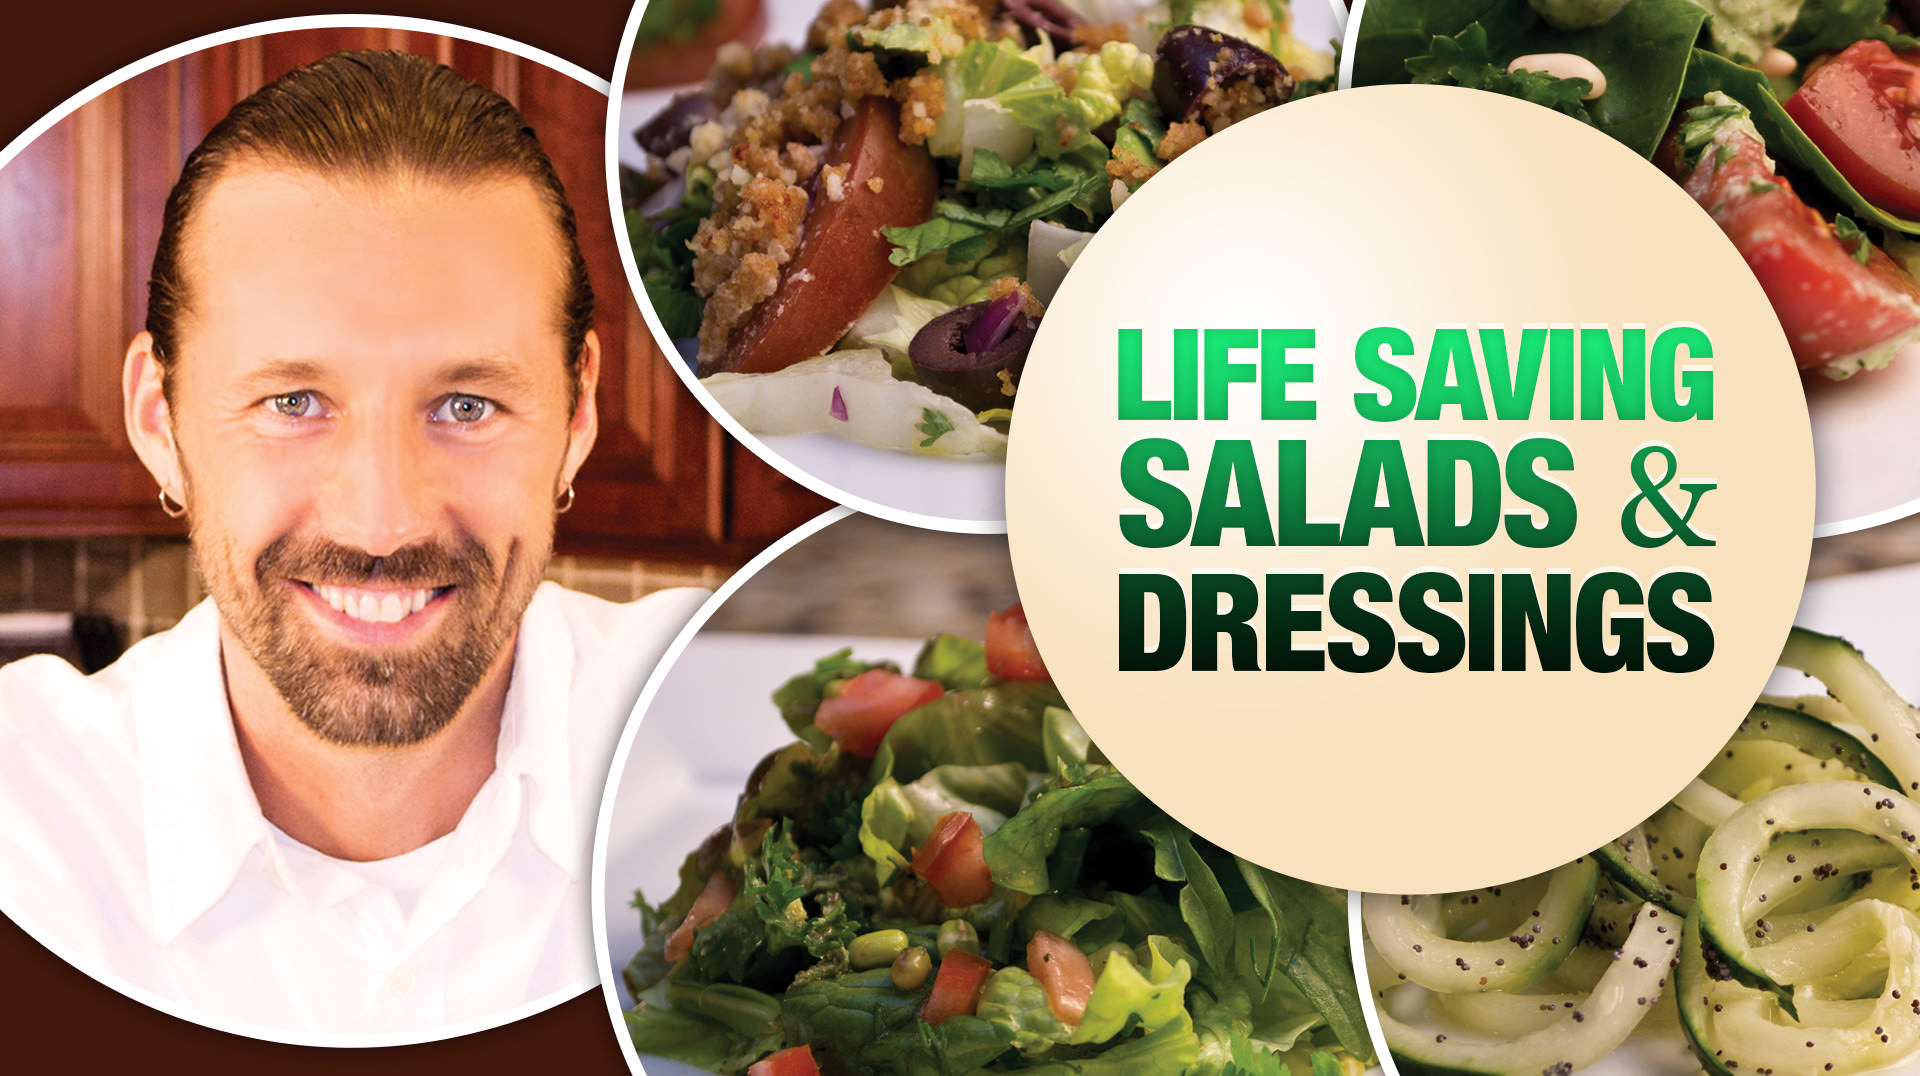 vimeo-life-saving-salads